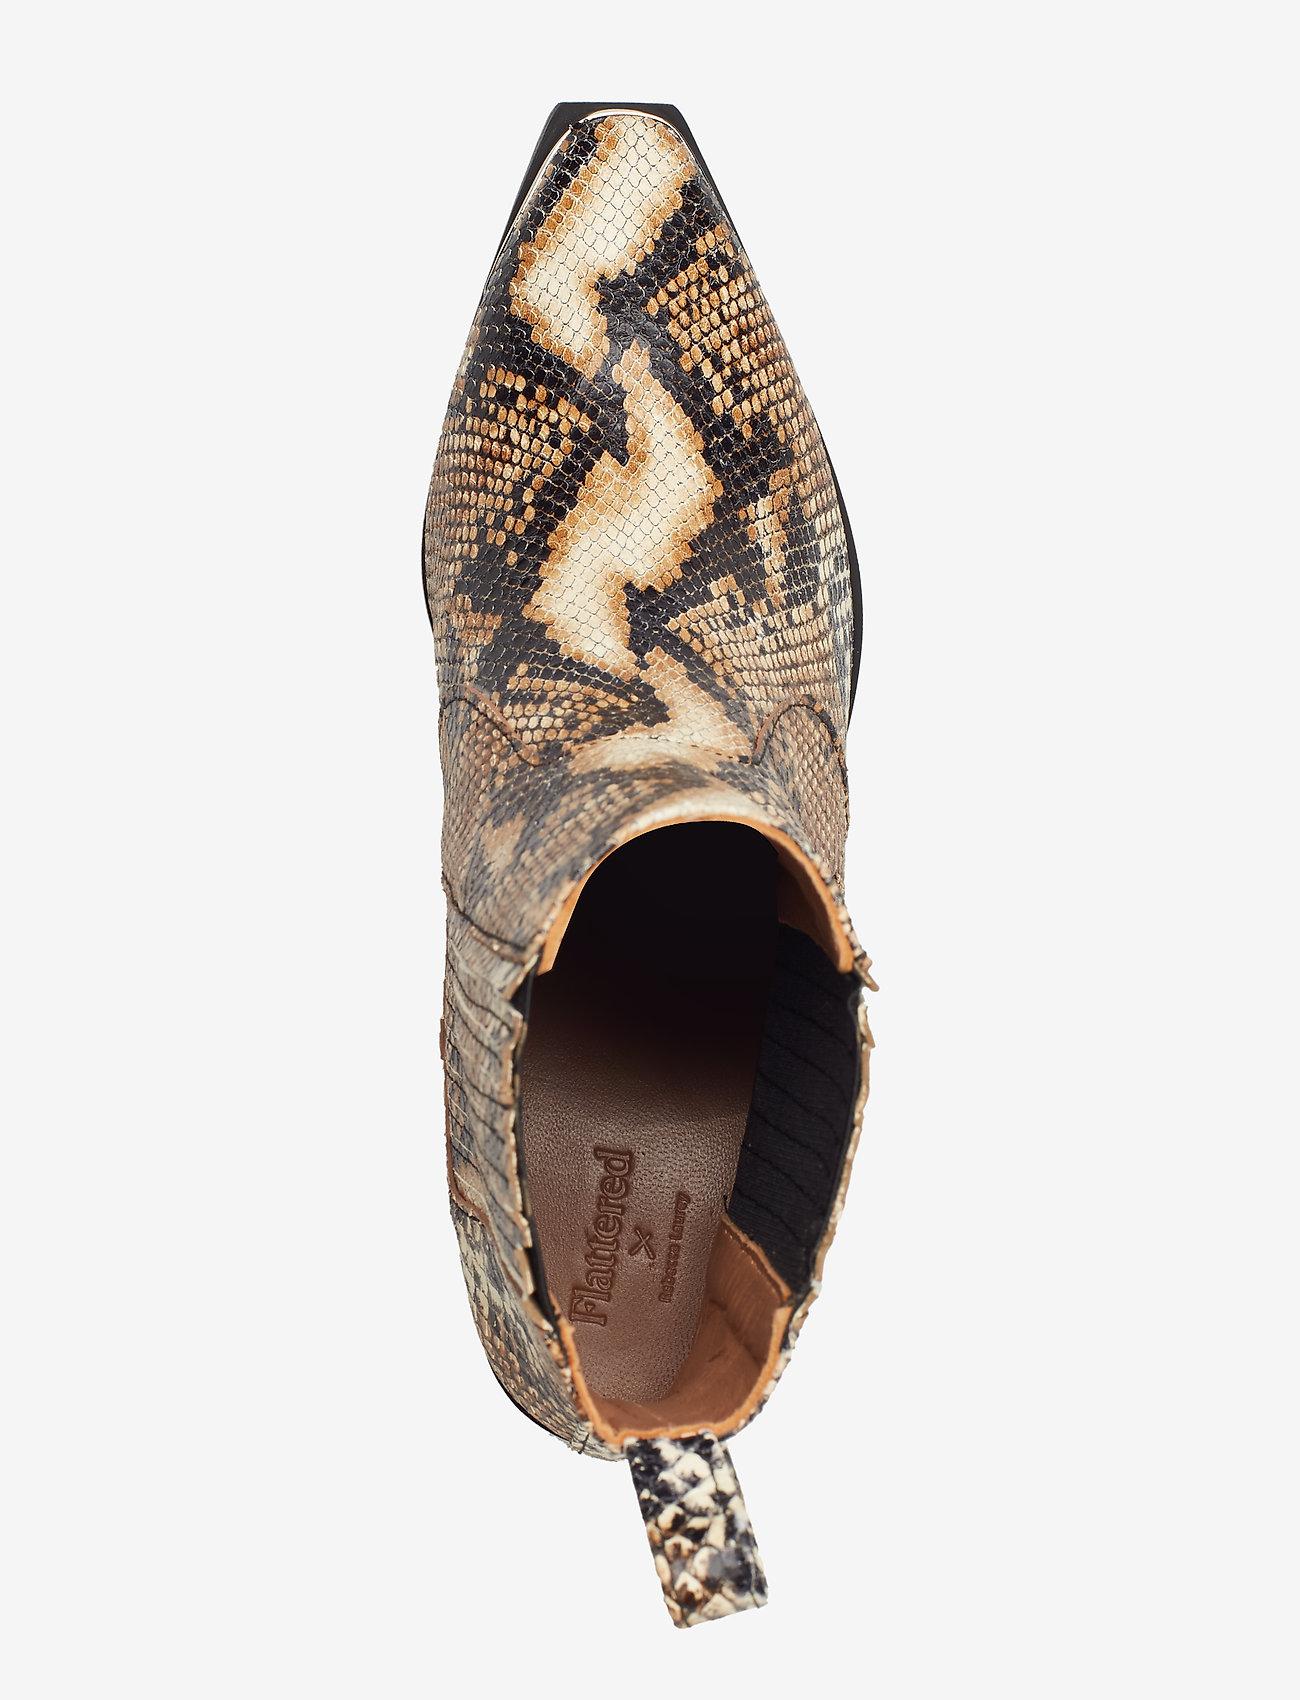 Särskild rabattRebecca Snake Nappa Boot Sand 1797 Flattered V9USP odxEj